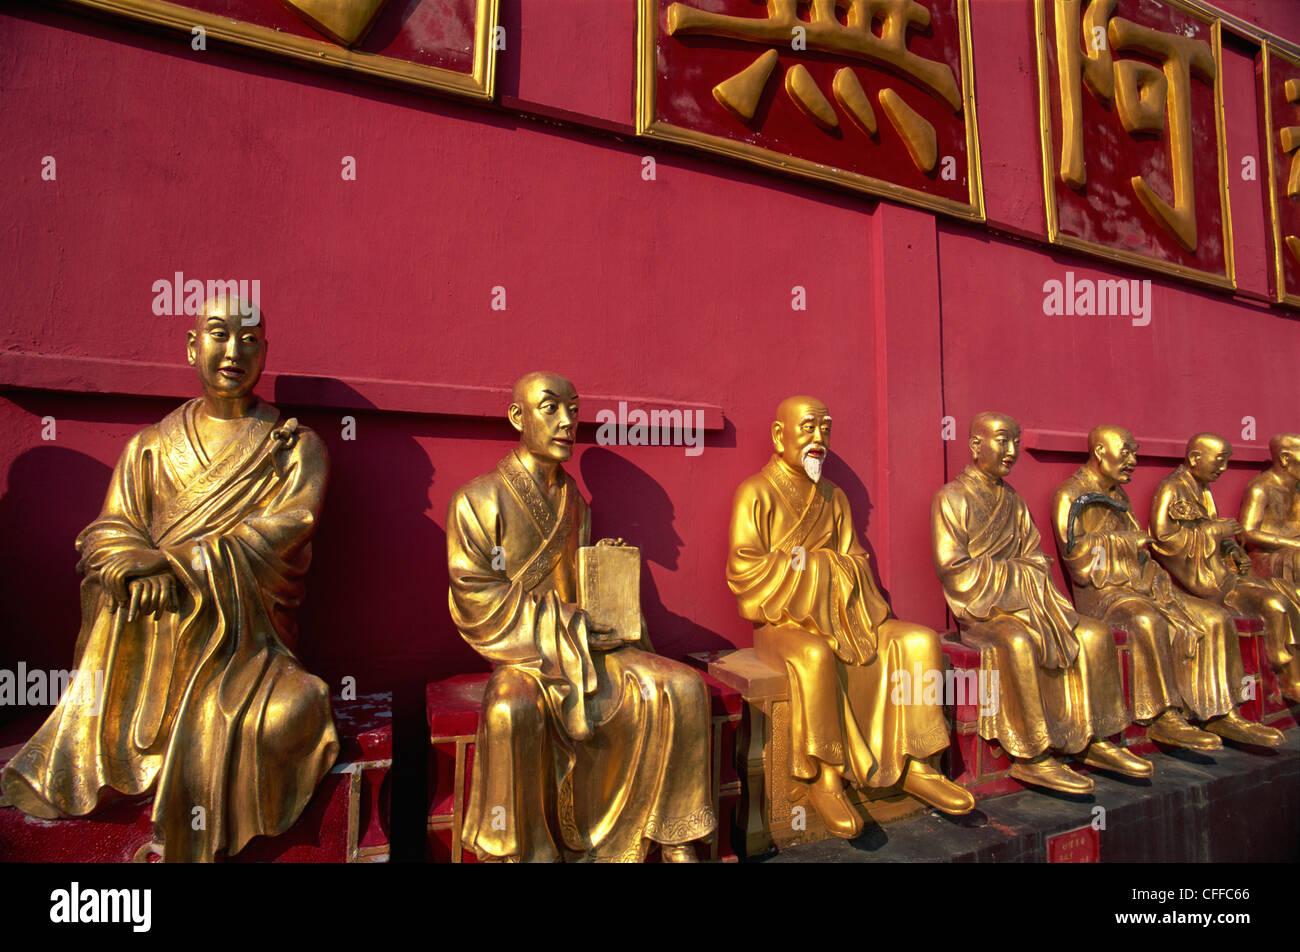 China, Hong Kong, New Territories, Sha Tin, Buddha Statues in the Ten Thousand Buddha Monastery - Stock Image